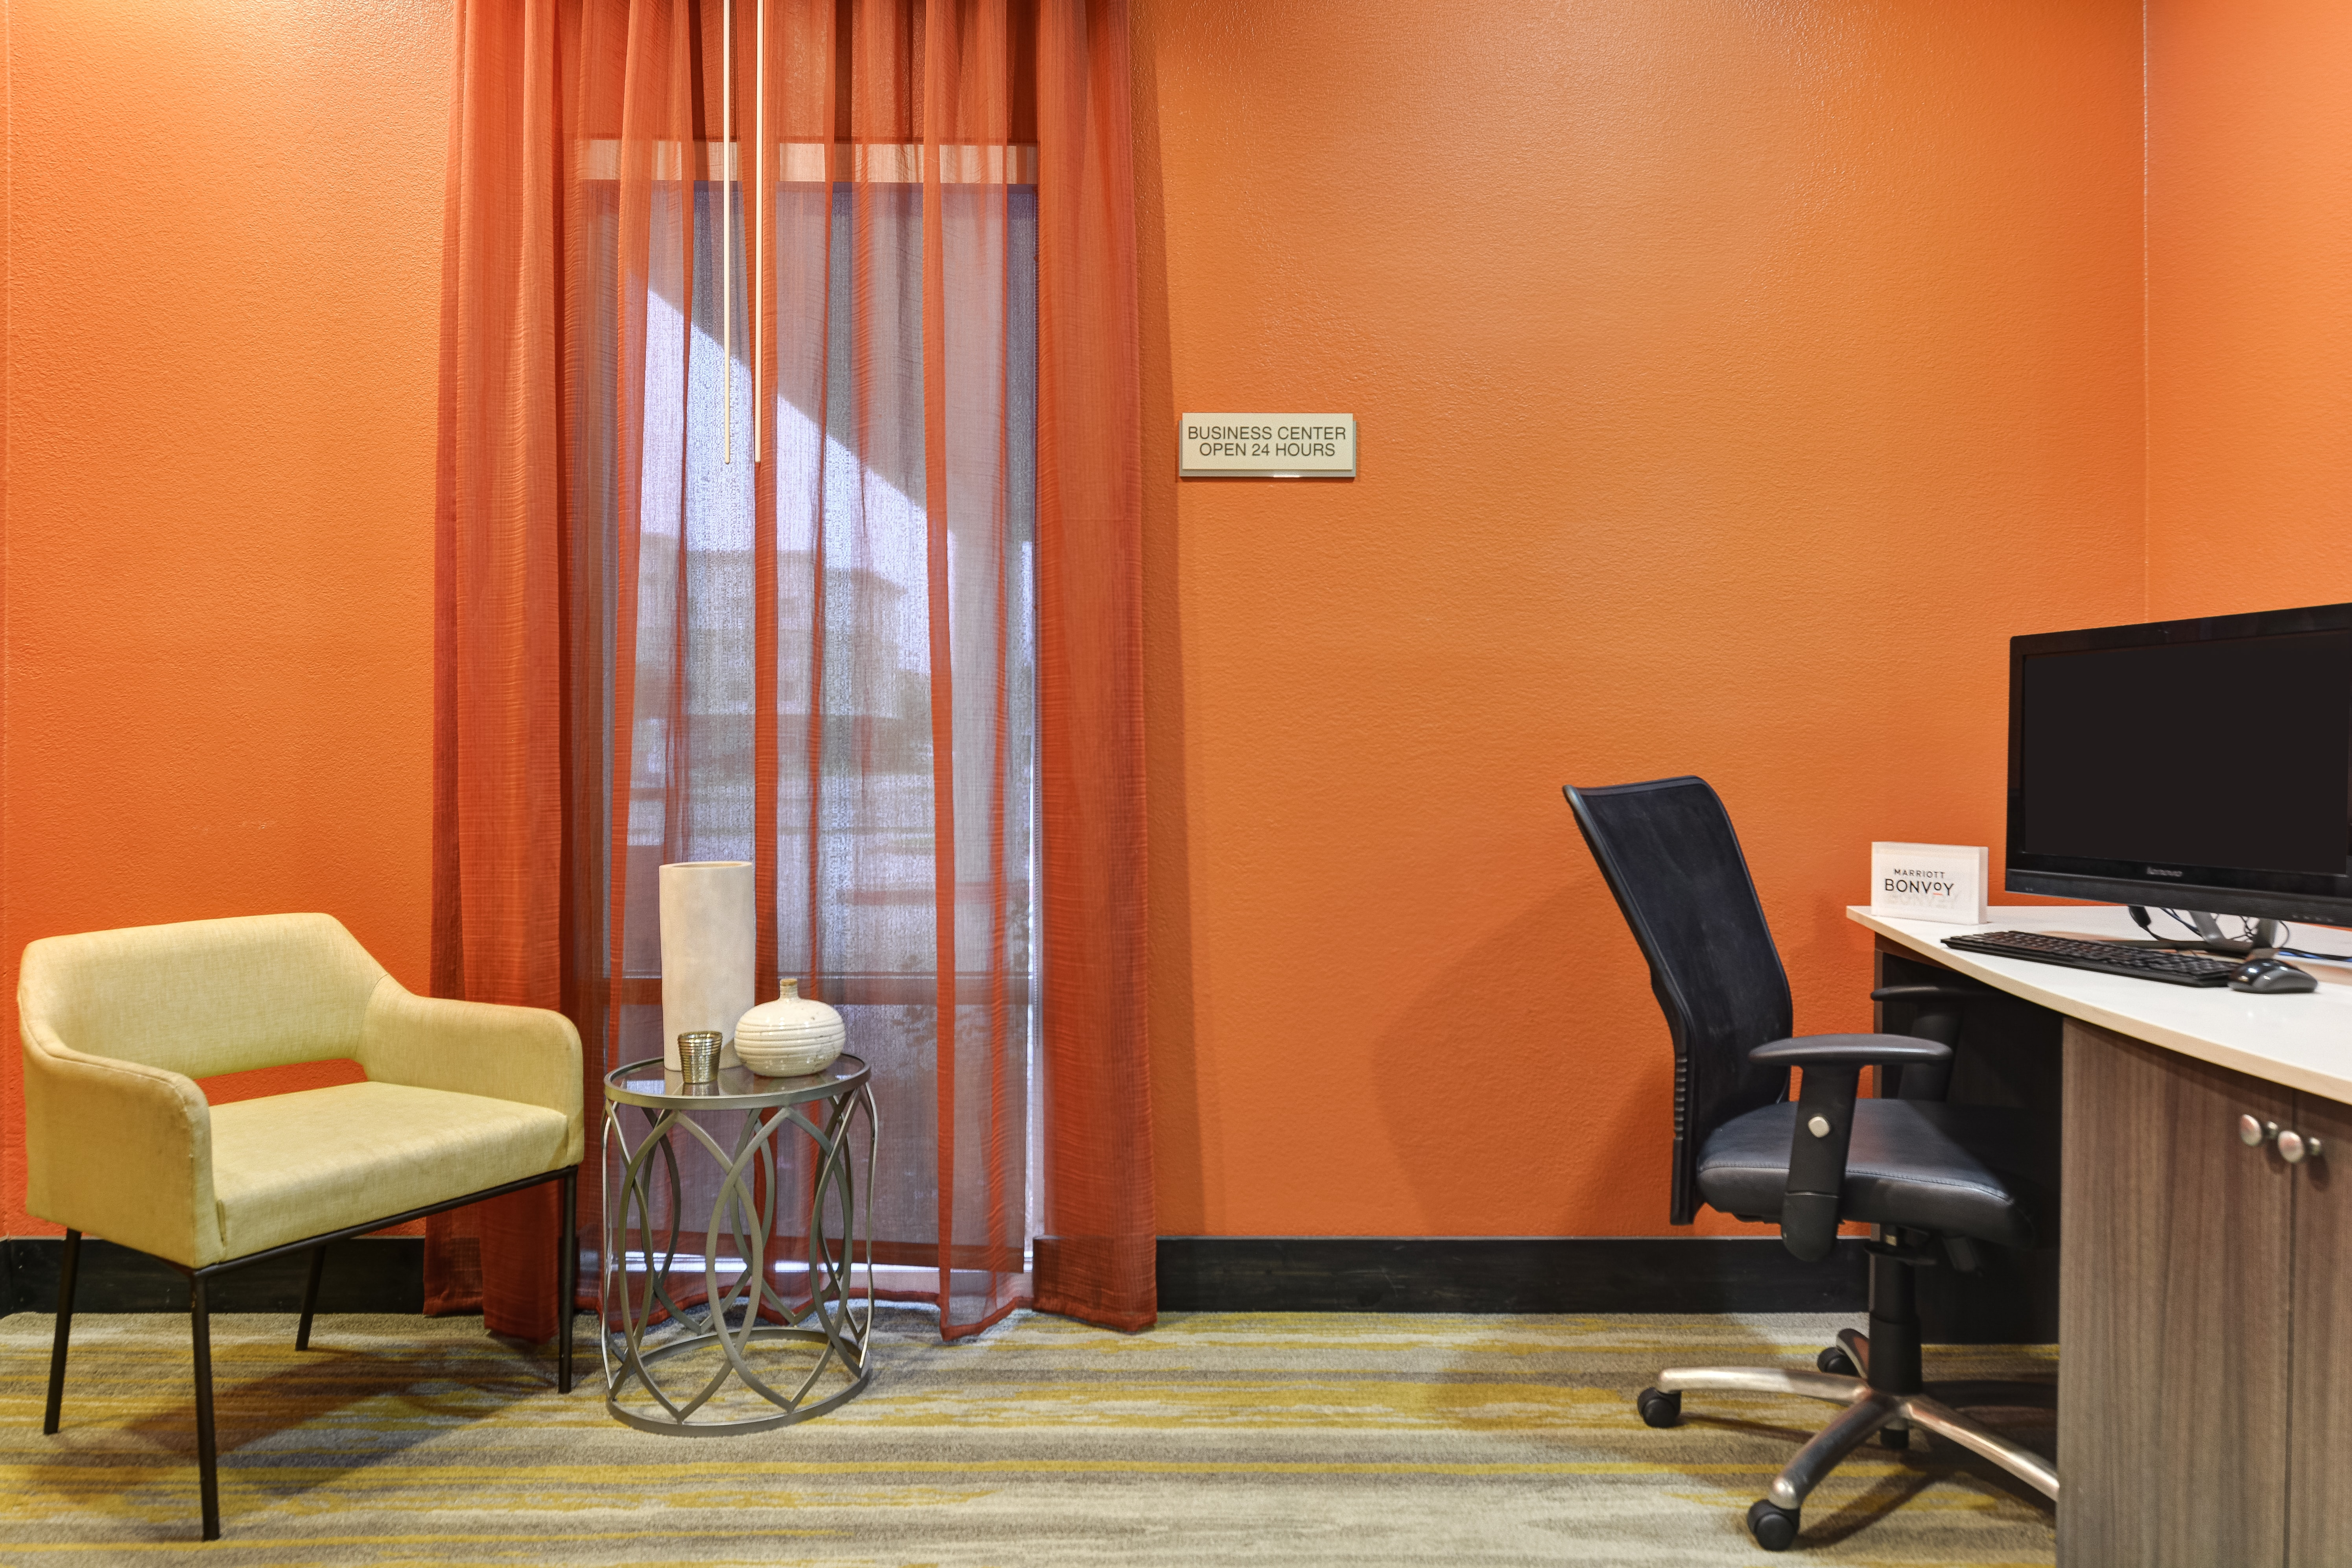 https://www.hotelsbyday.com/_data/default-hotel_image/3/15455/springhill-suites-bo-osdwv.jpg